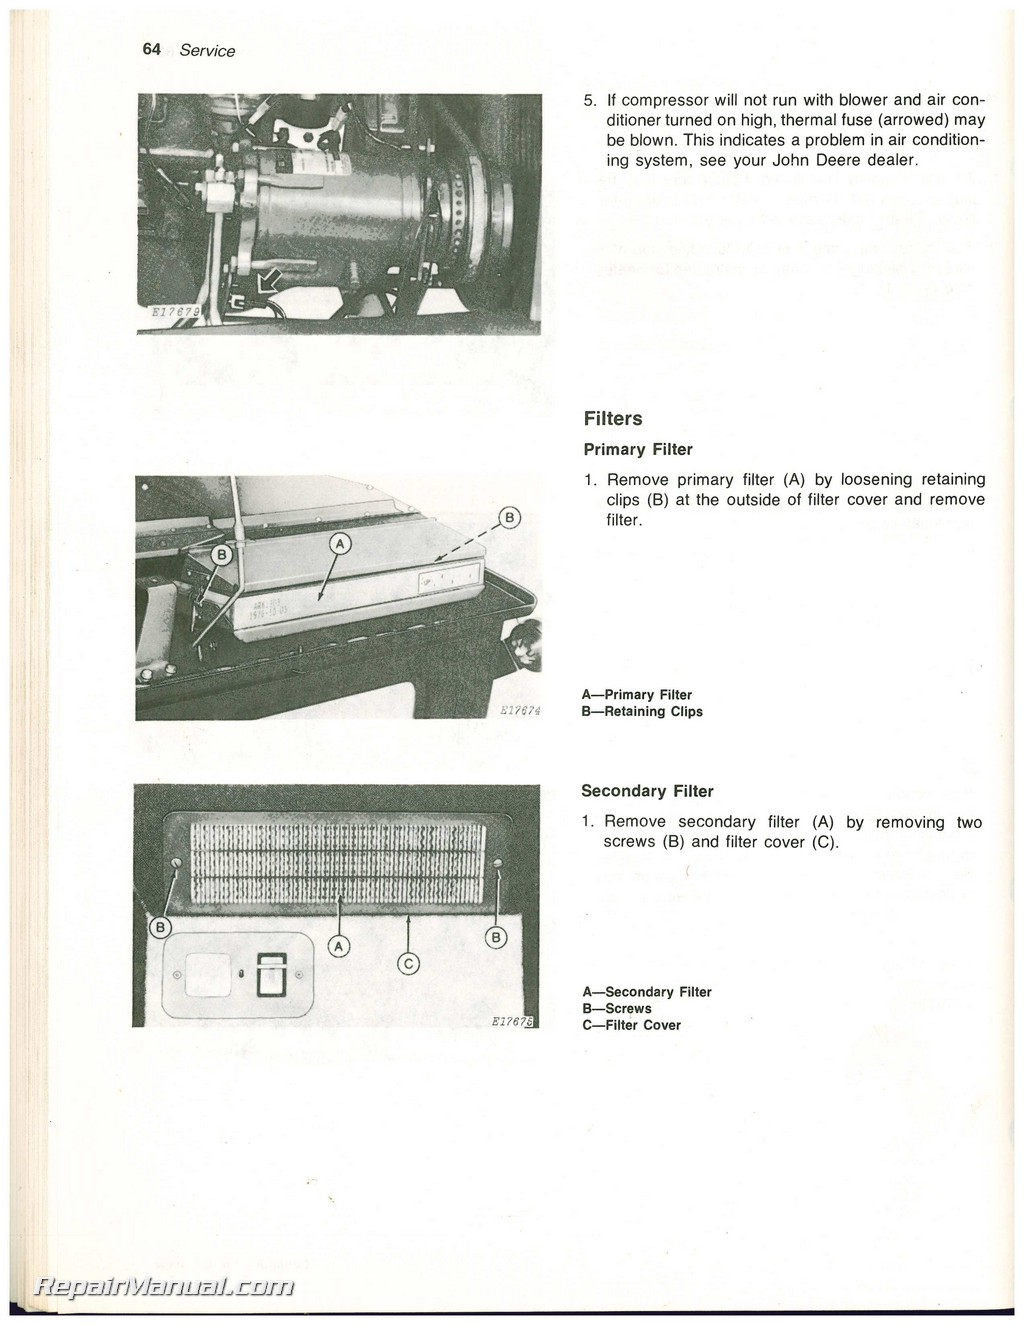 2320 John Deere Fuse Box Worksheet And Wiring Diagram 2005 3120 Used 2420 Self Propelled Windrowers Operators Manual Rh Repairmanual Com On 4450